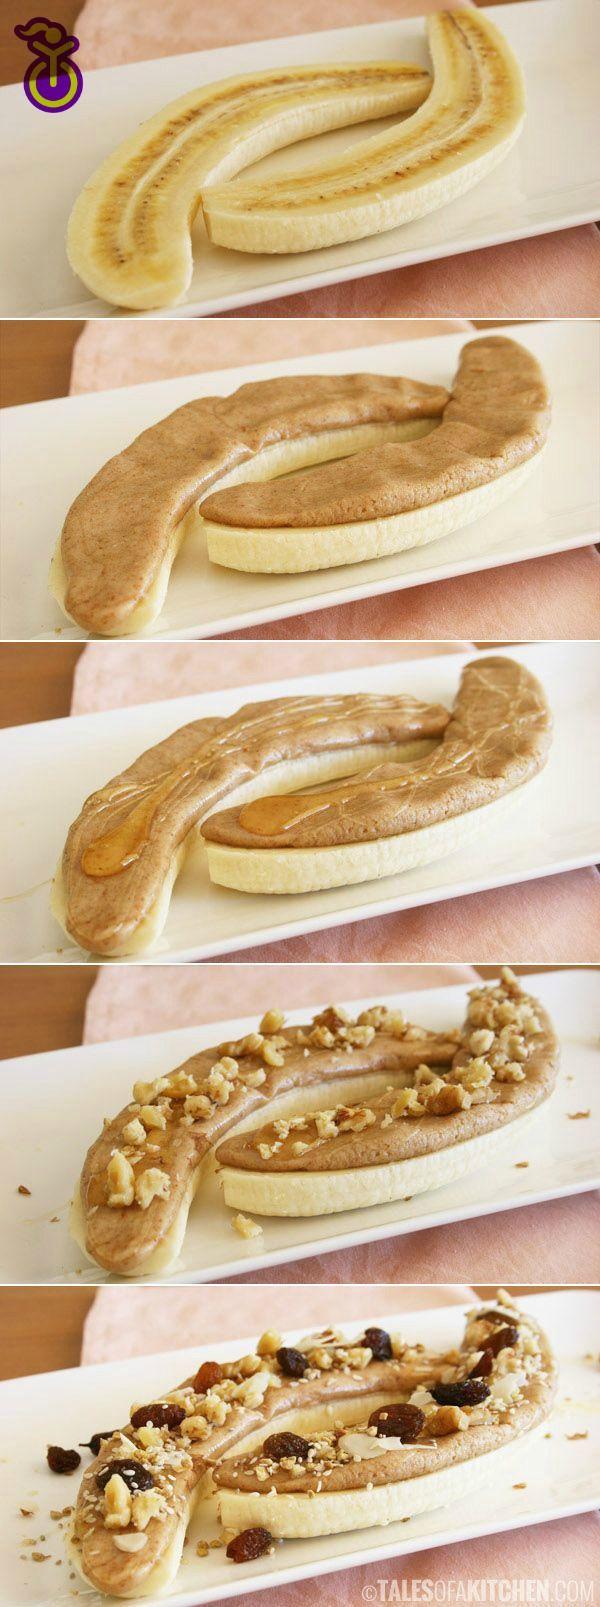 What a yummy snack! #SavorySunday